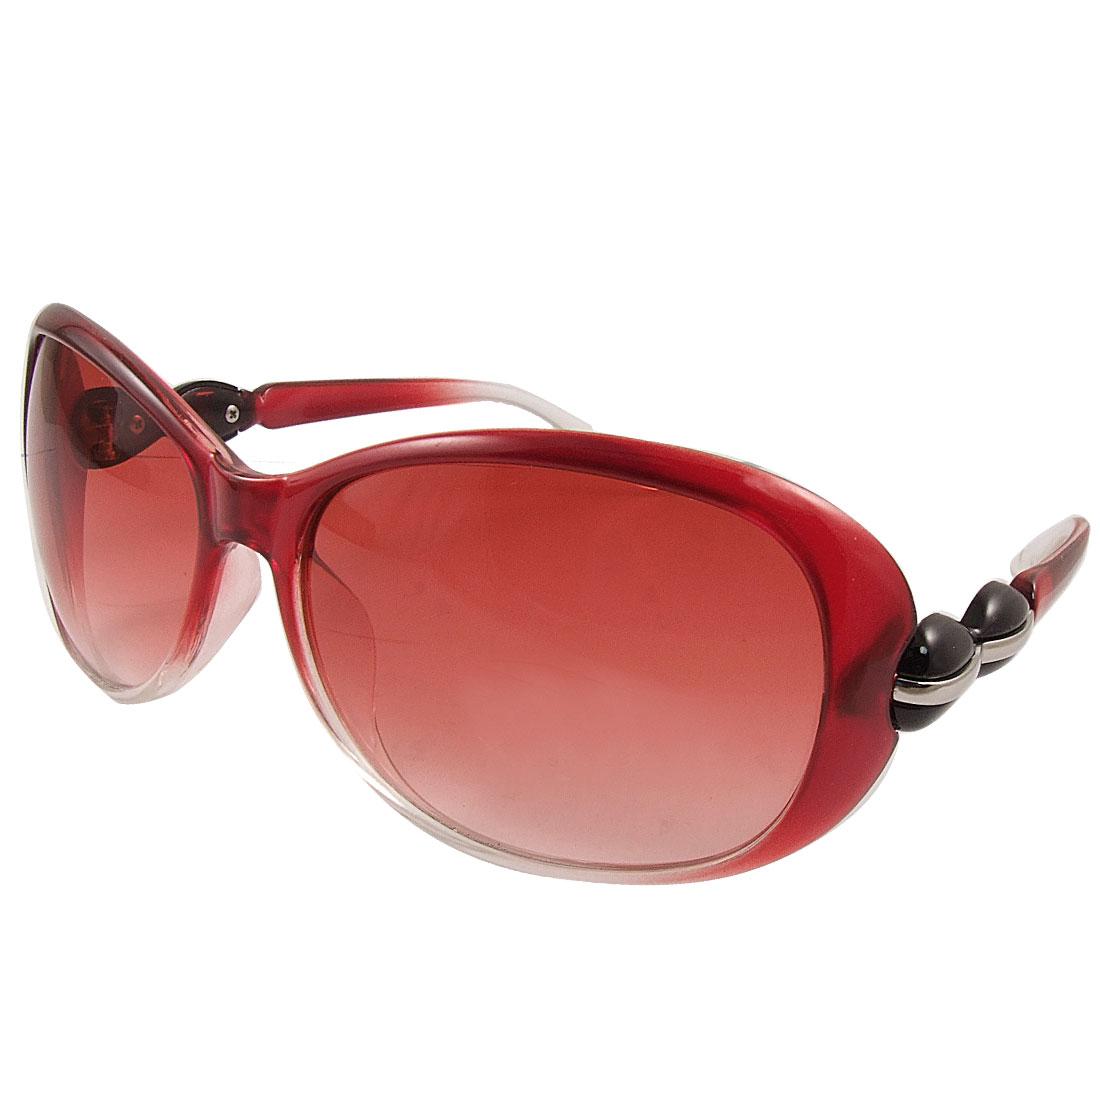 Clear Red Plastic Full Rim Single Bridge Sunglasses for Woman